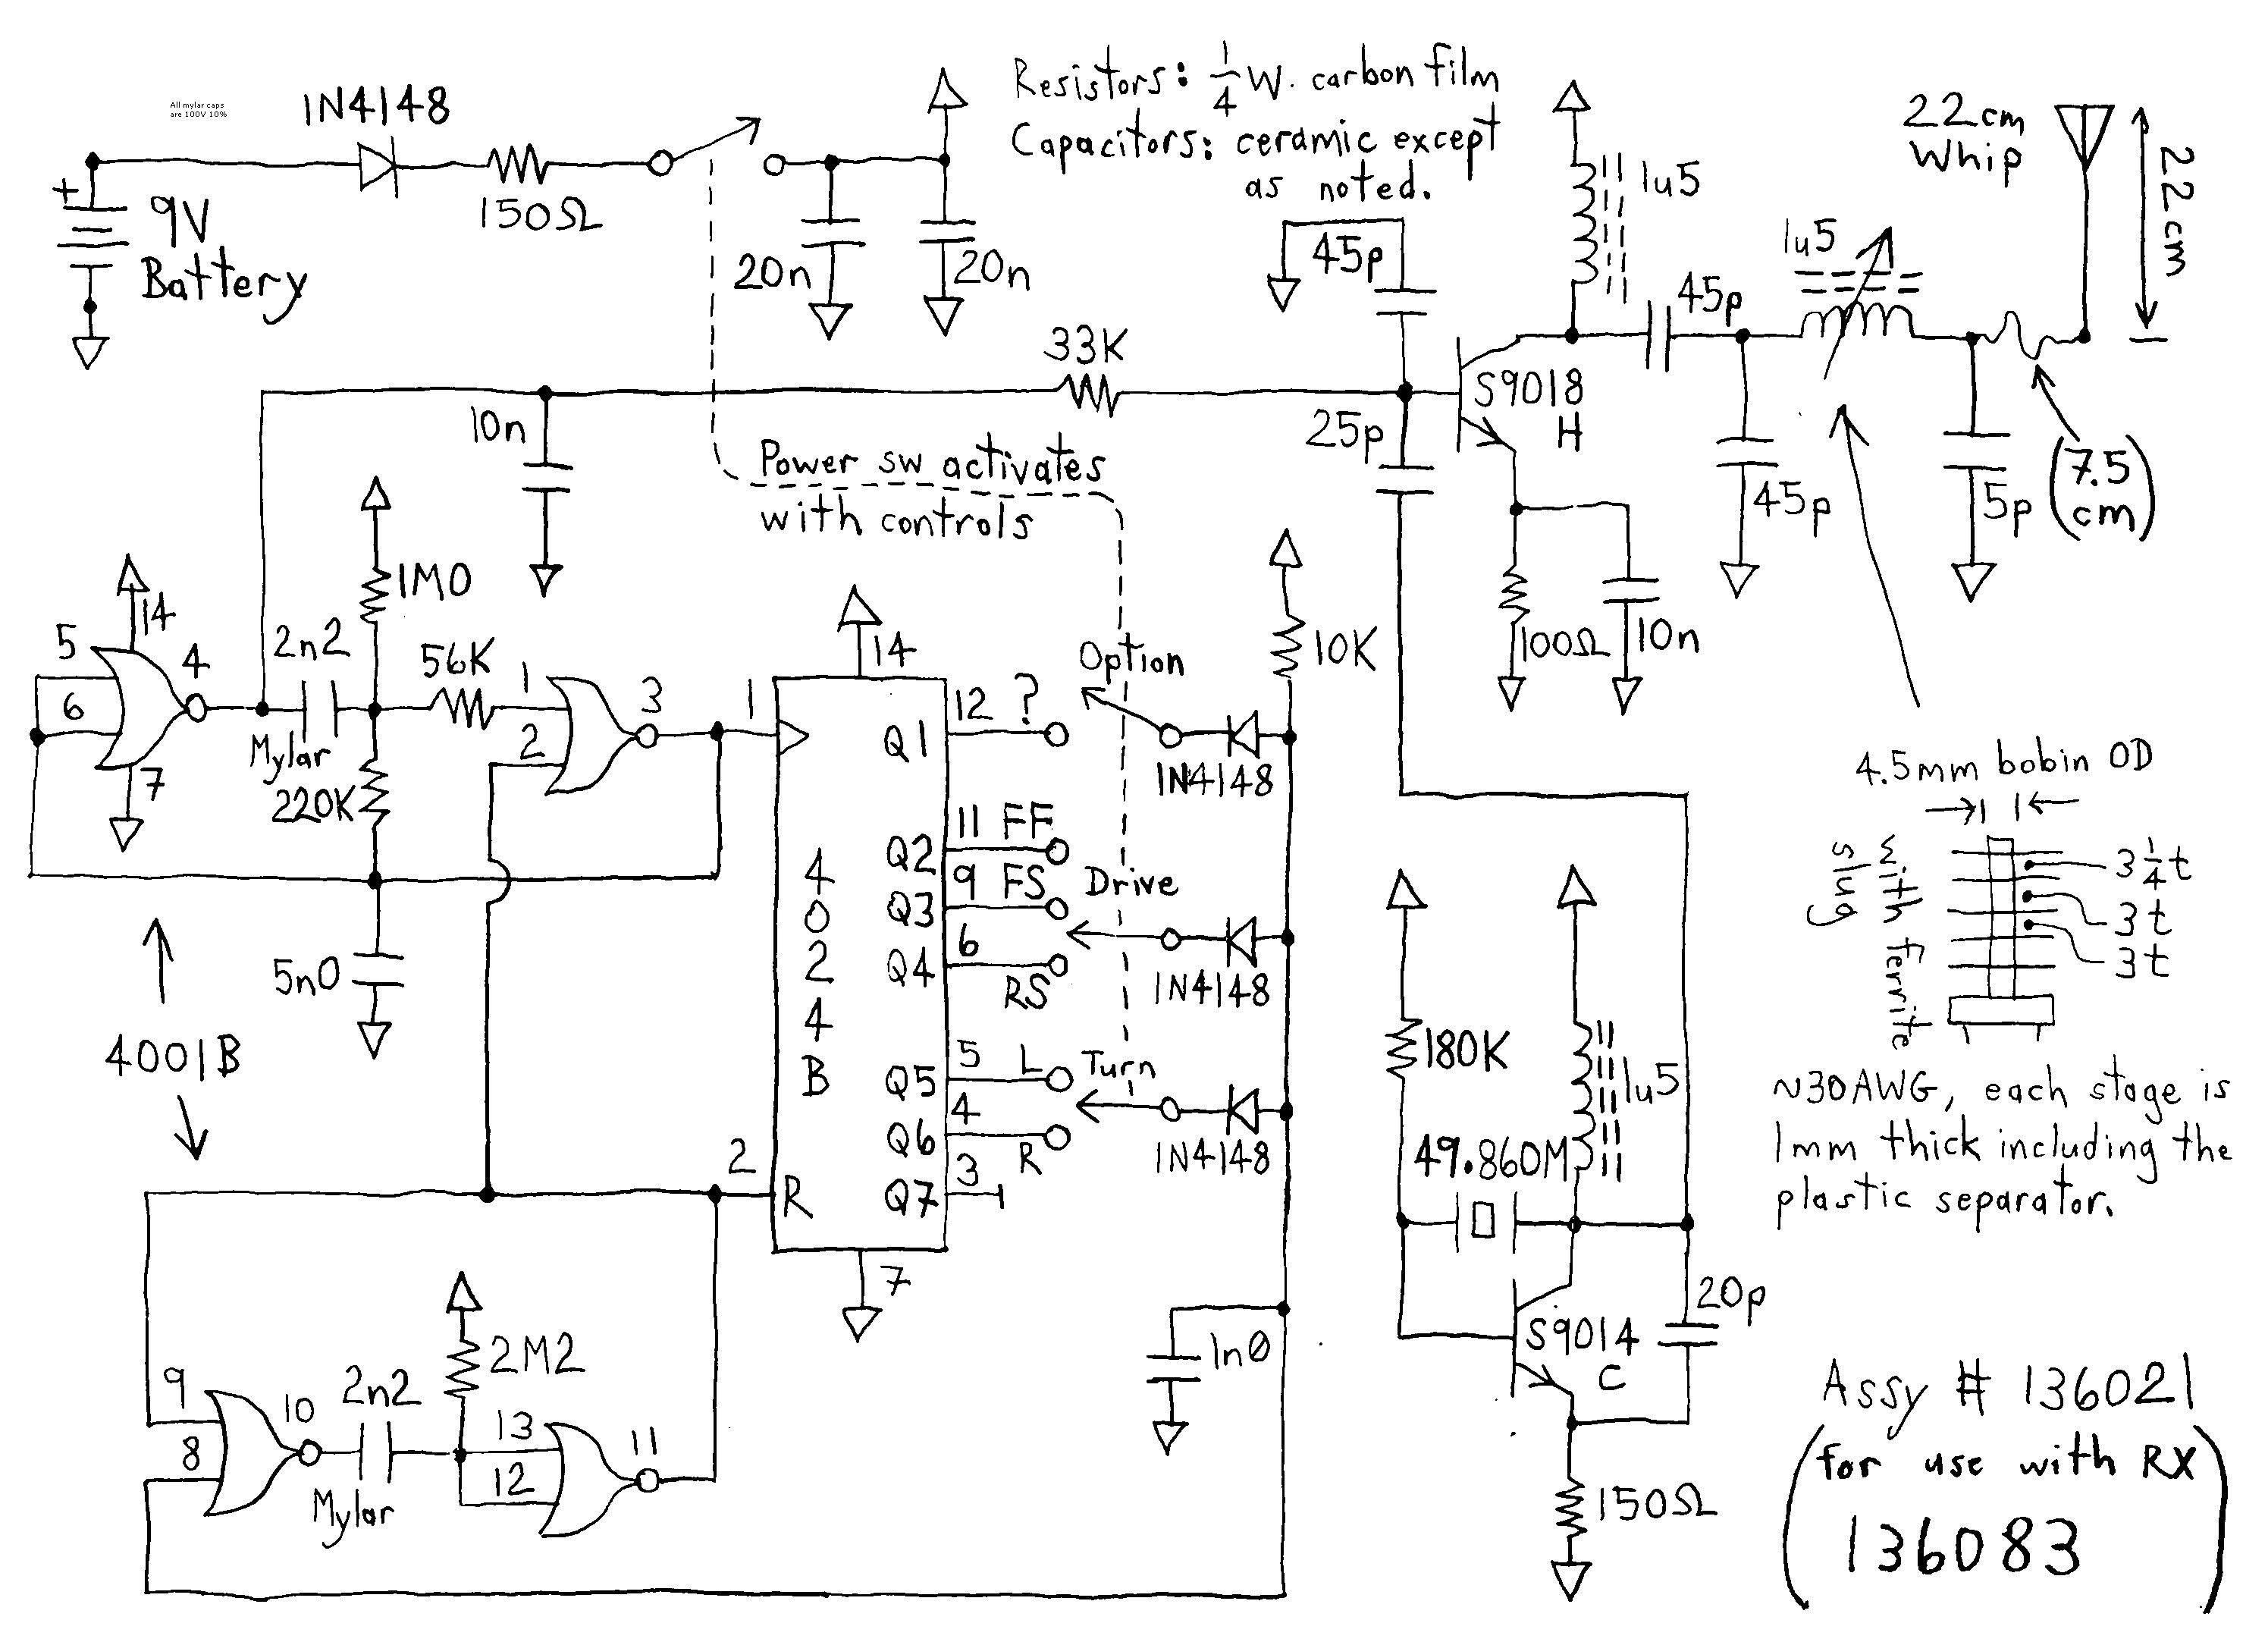 Wiring Diagram for Arduino Maker 19 Plex Wiring Diagram Symbols Automotive Design with Of Wiring Diagram for Arduino Maker